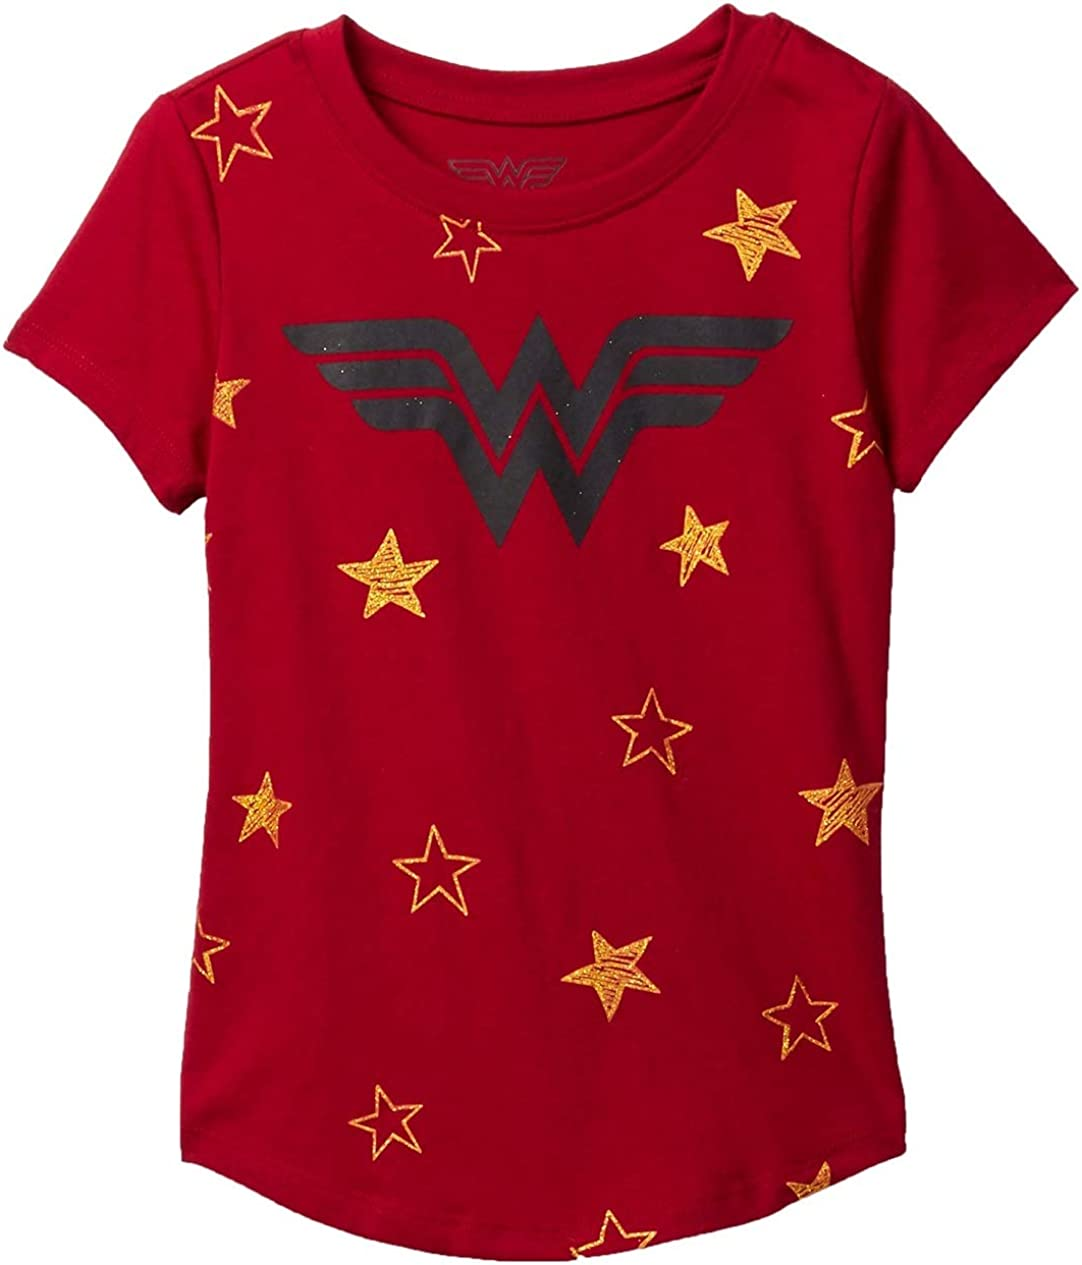 Kid/'s Glitter Shirt Wonder Woman Youth Shirt Kid/'s shirt Wonder Woman Kid/'s shirt Glitter Shirt Kid/'s Glitter Shirt